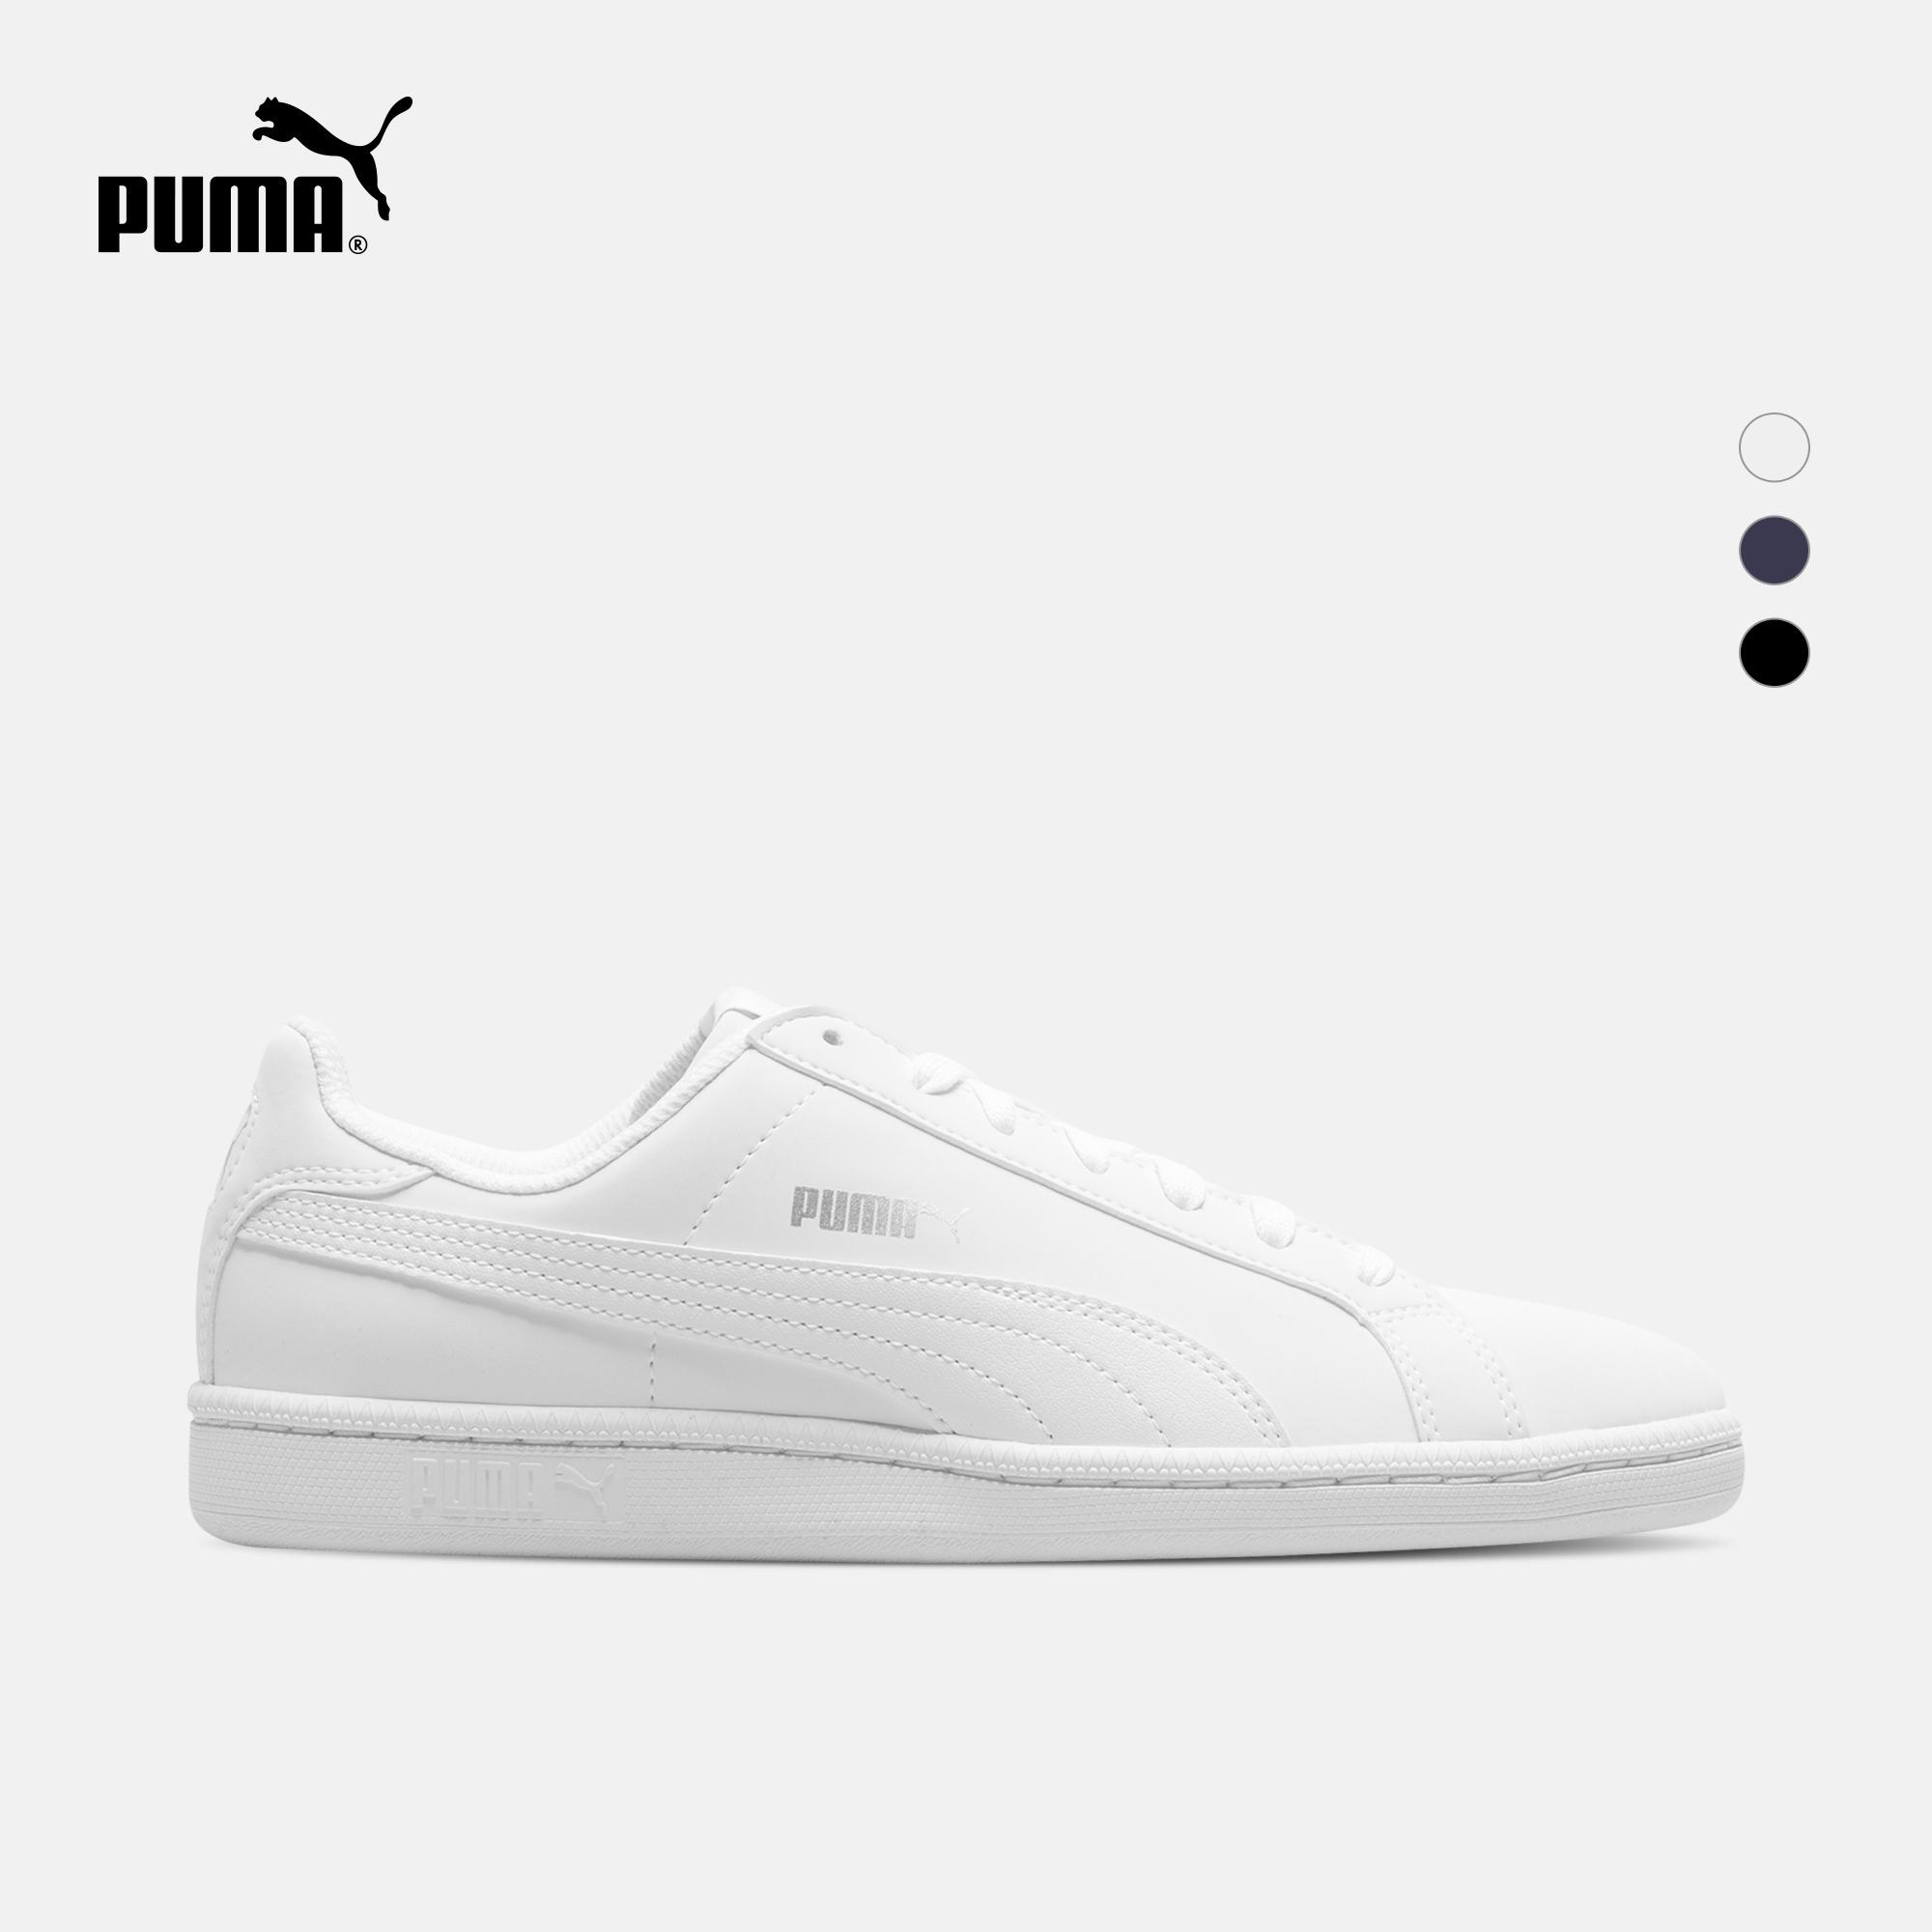 PUMA彪马官方 男女同款休闲鞋 Smash Buck 356753